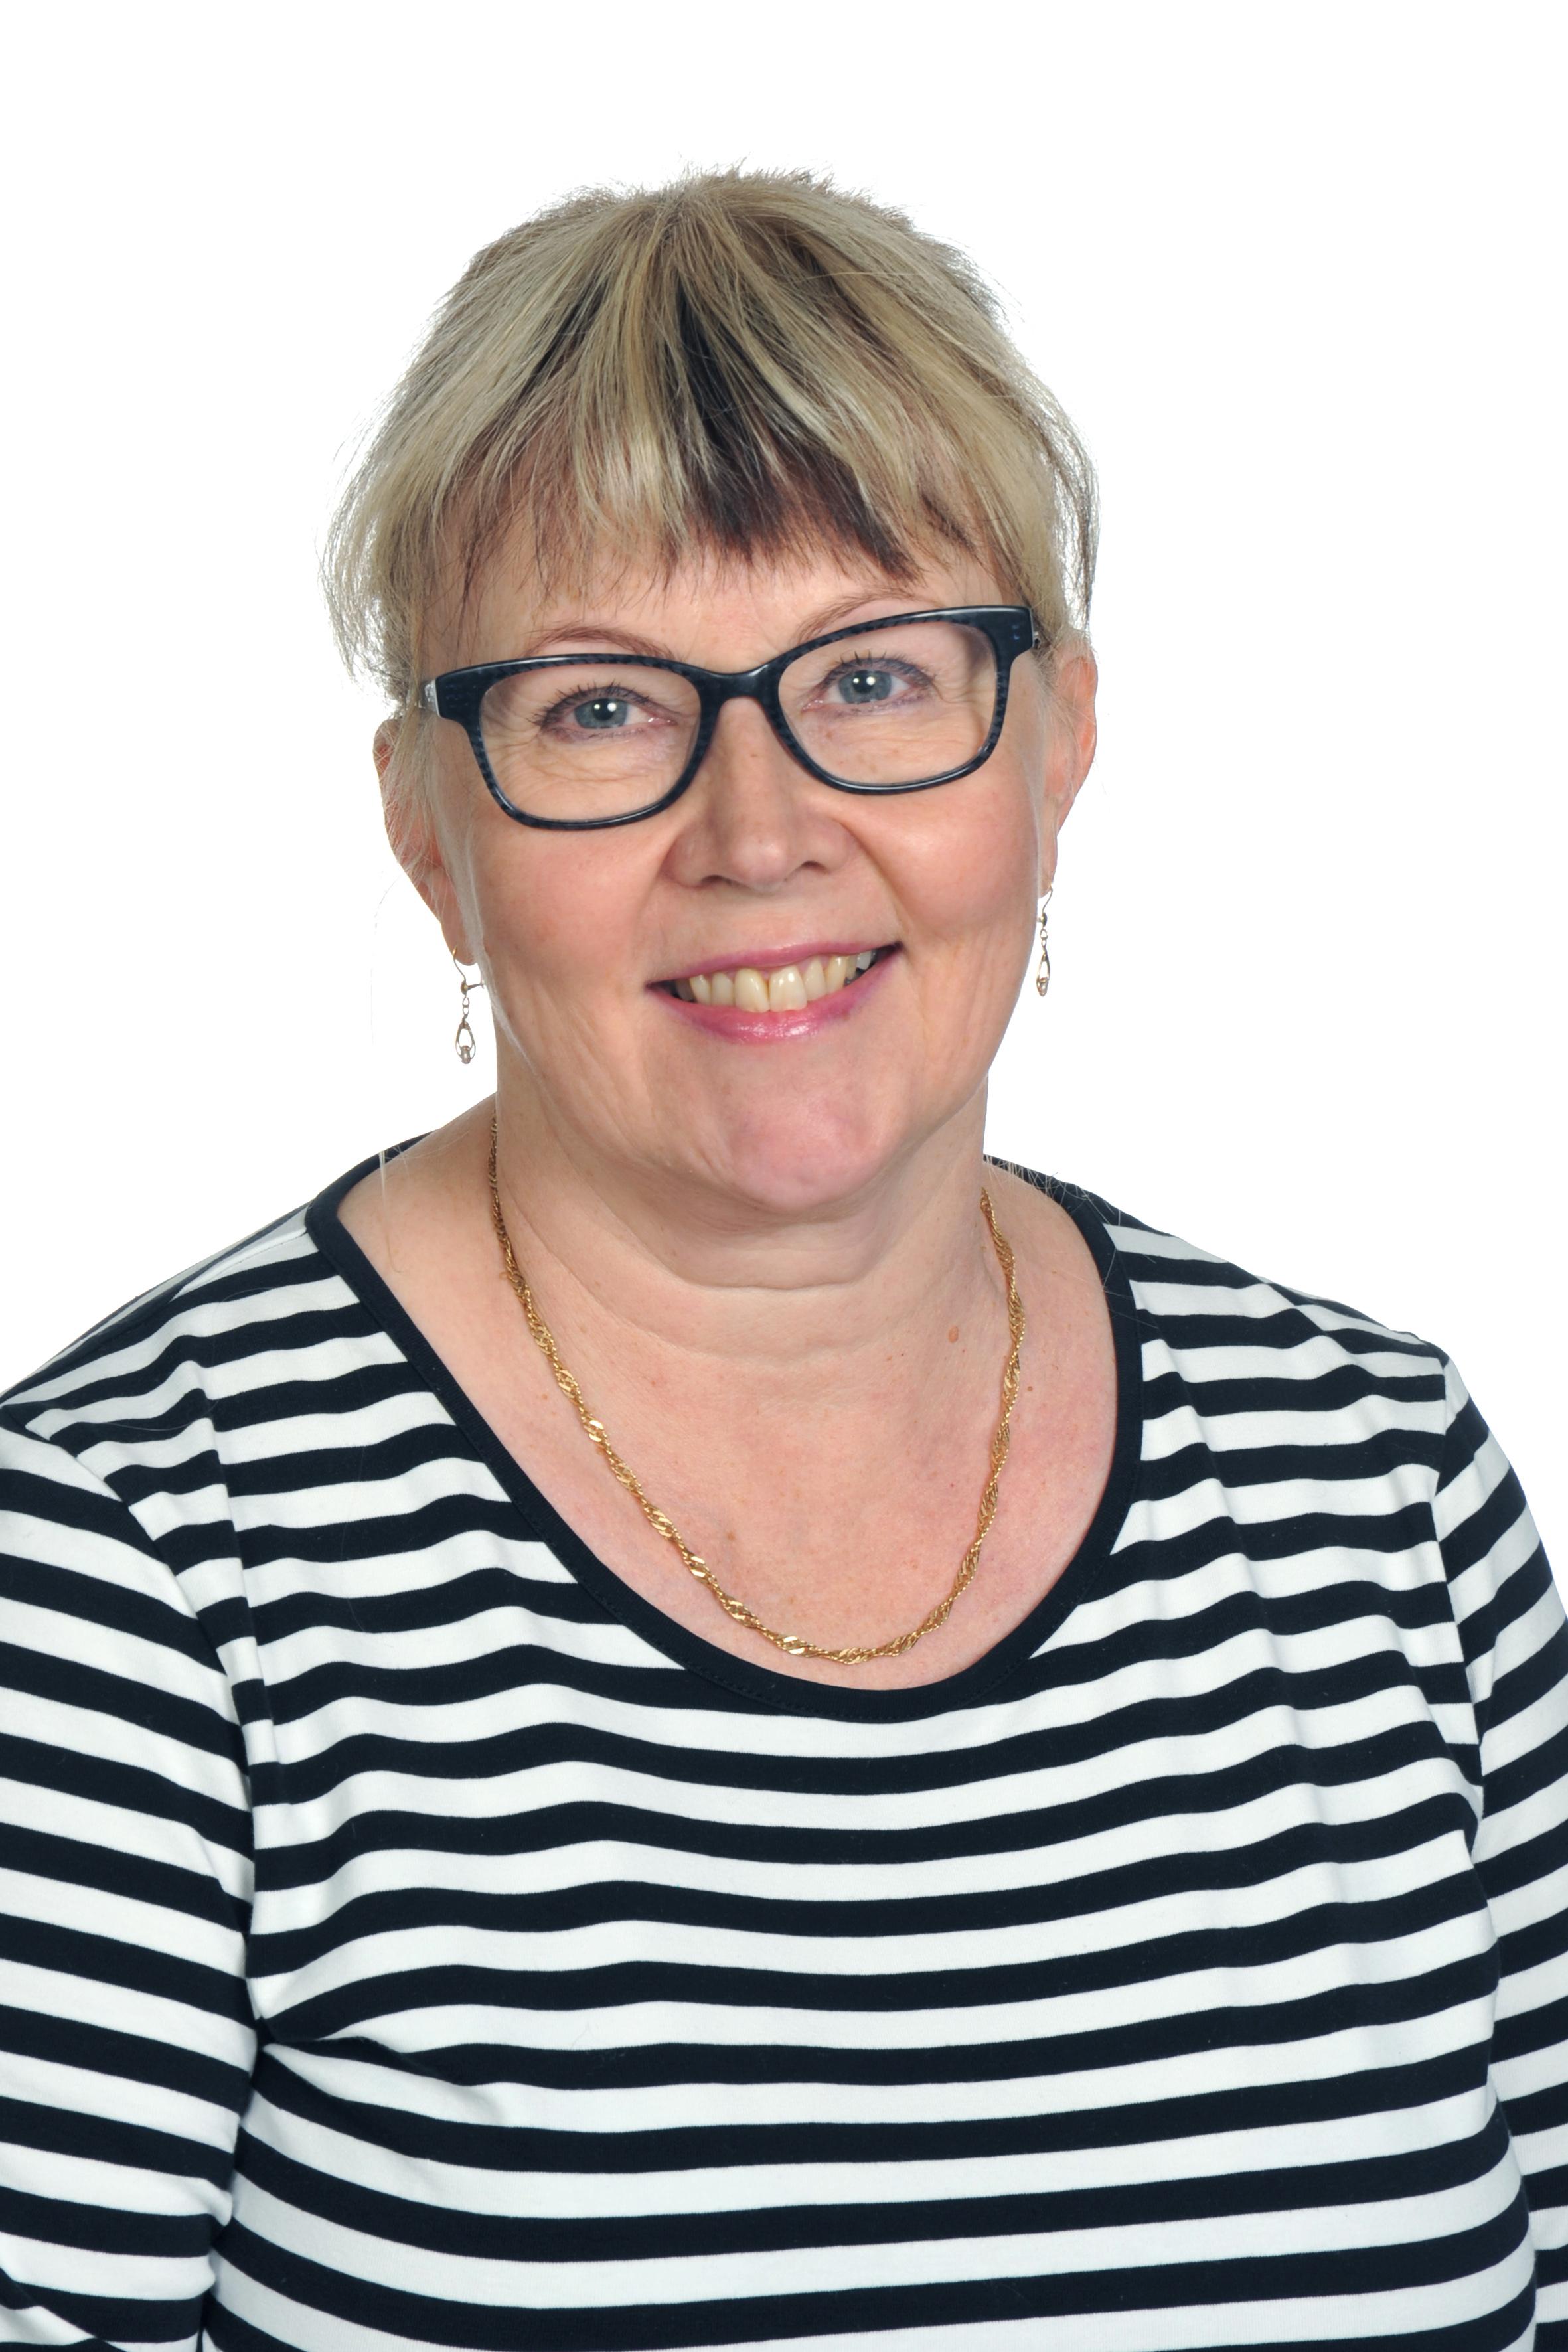 Neuvontahoitaja Liisa Kautto